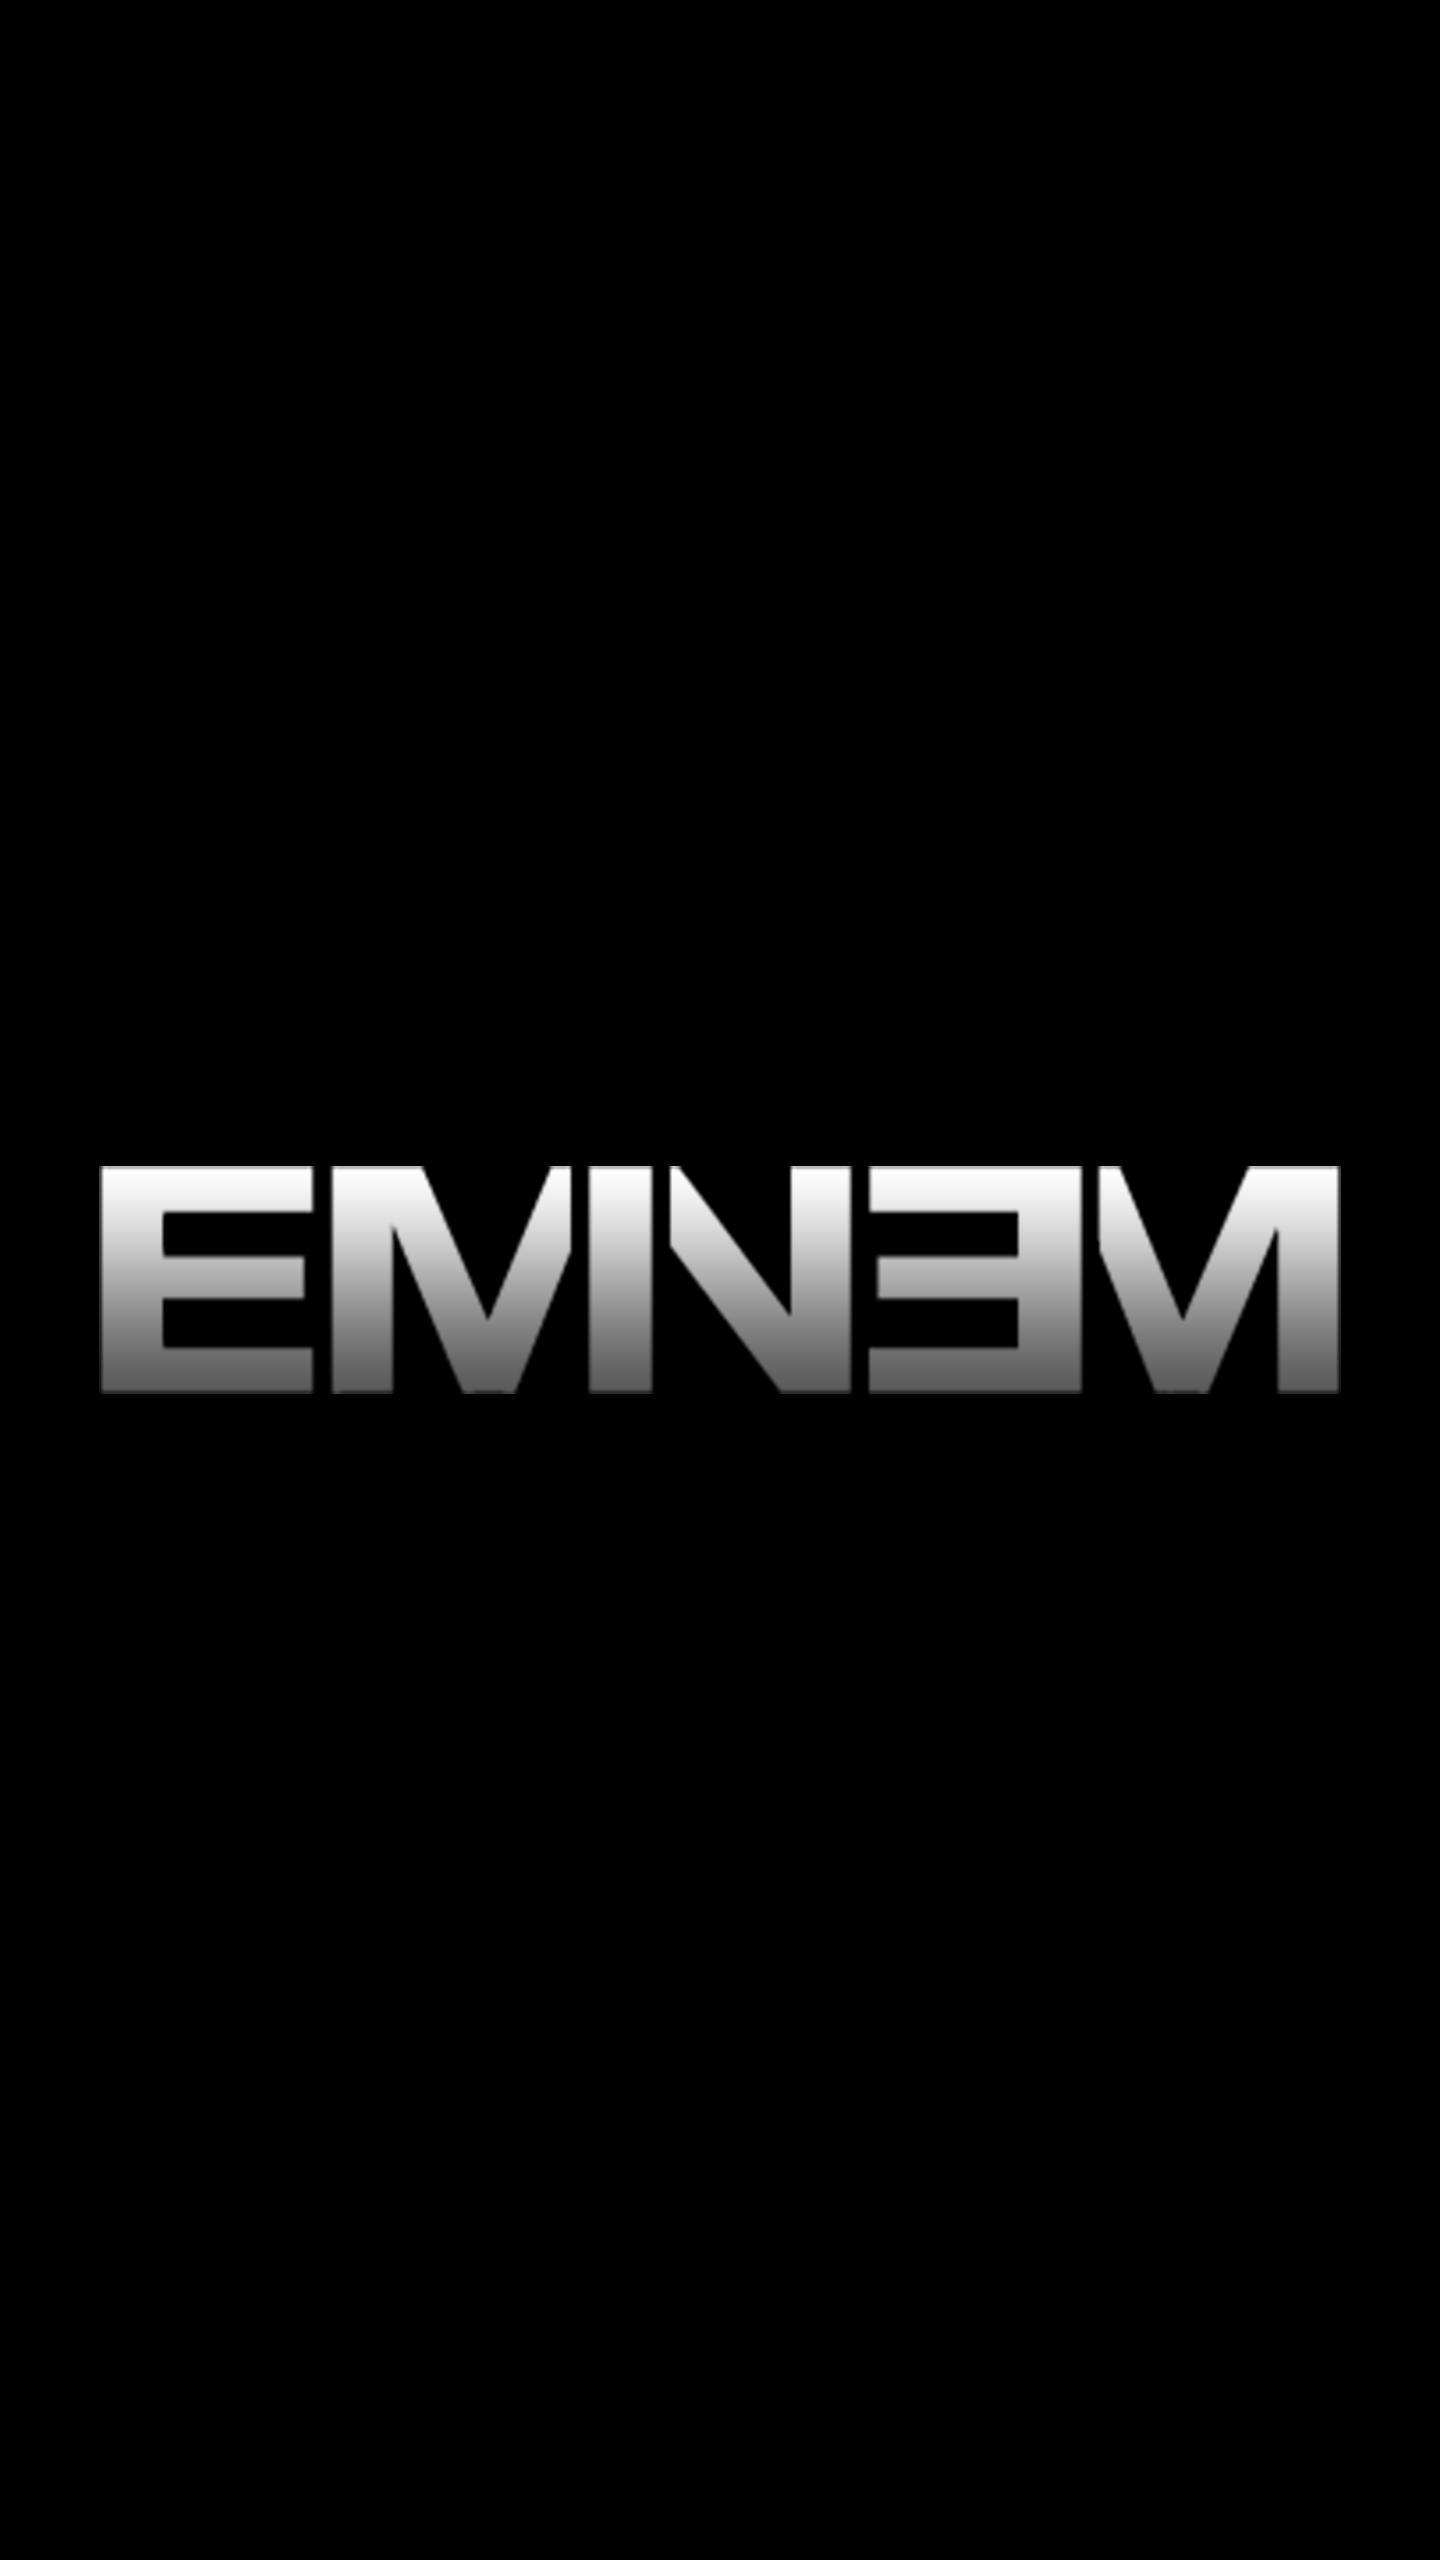 Eminem Logo AMOLED Wallpaper [1440x2560] Eminem 1440x2560